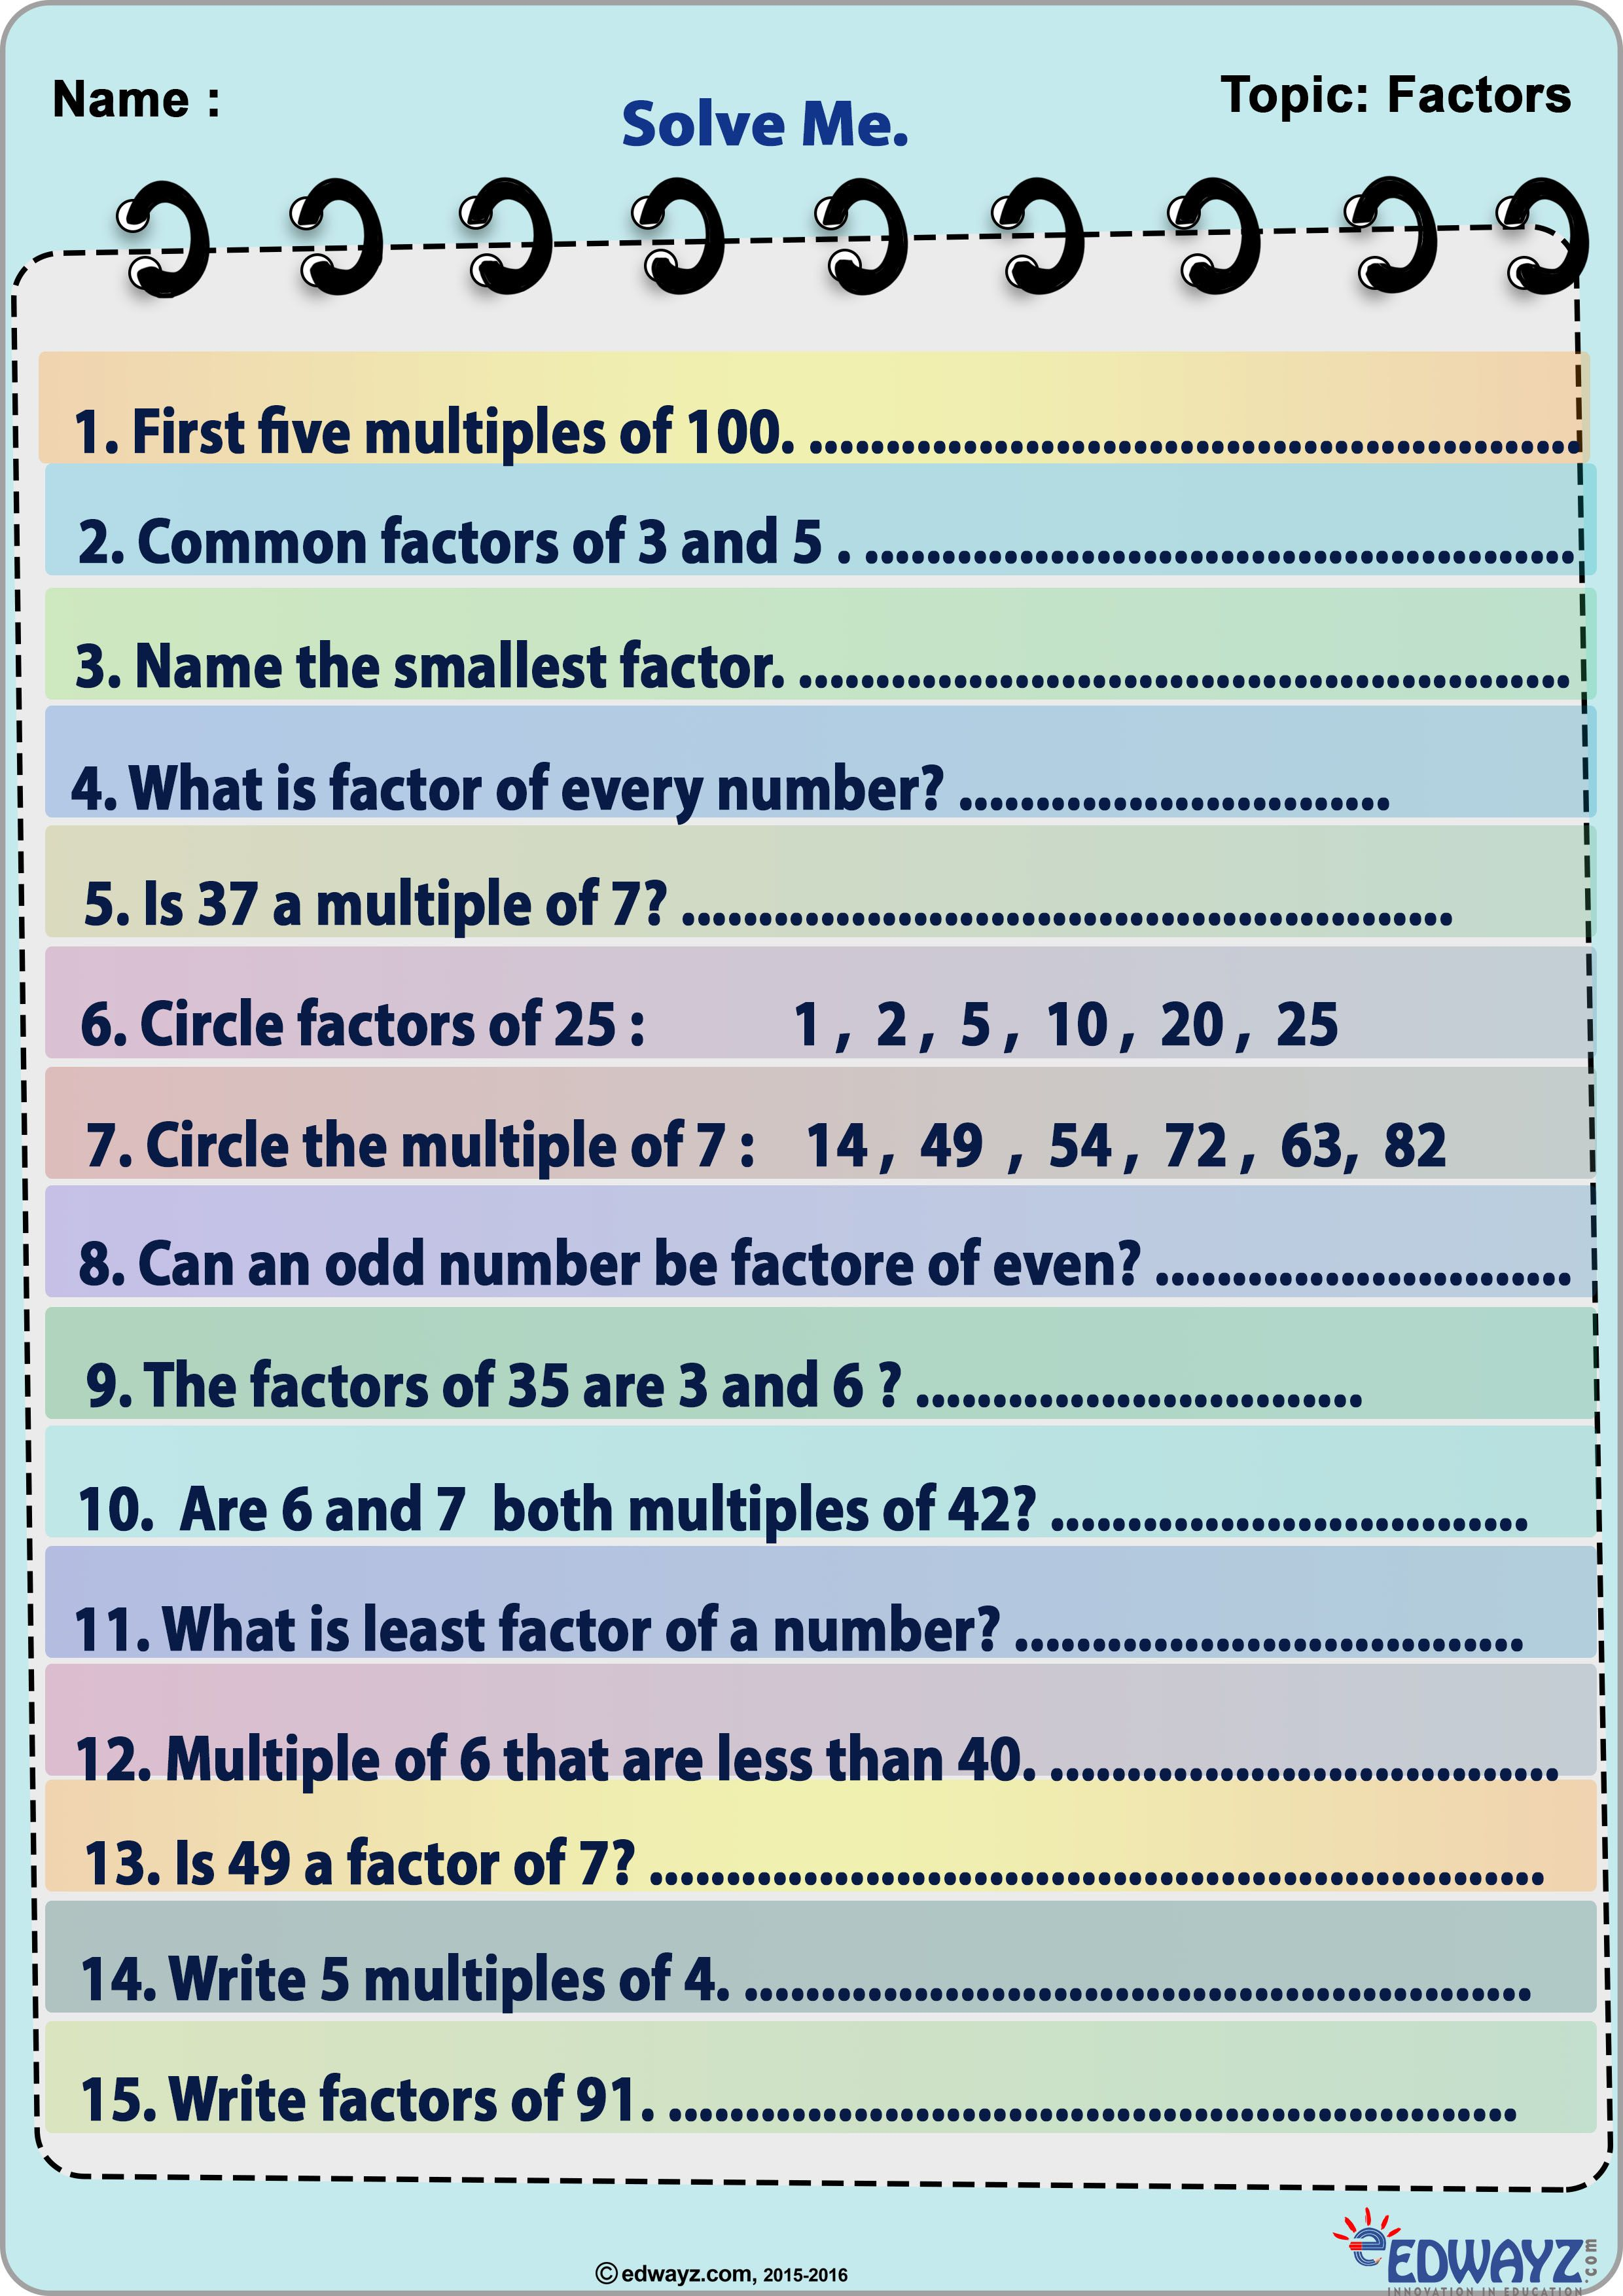 hight resolution of worksheets #math #factors #kids #funlearning #edwayz   Mental maths  worksheets